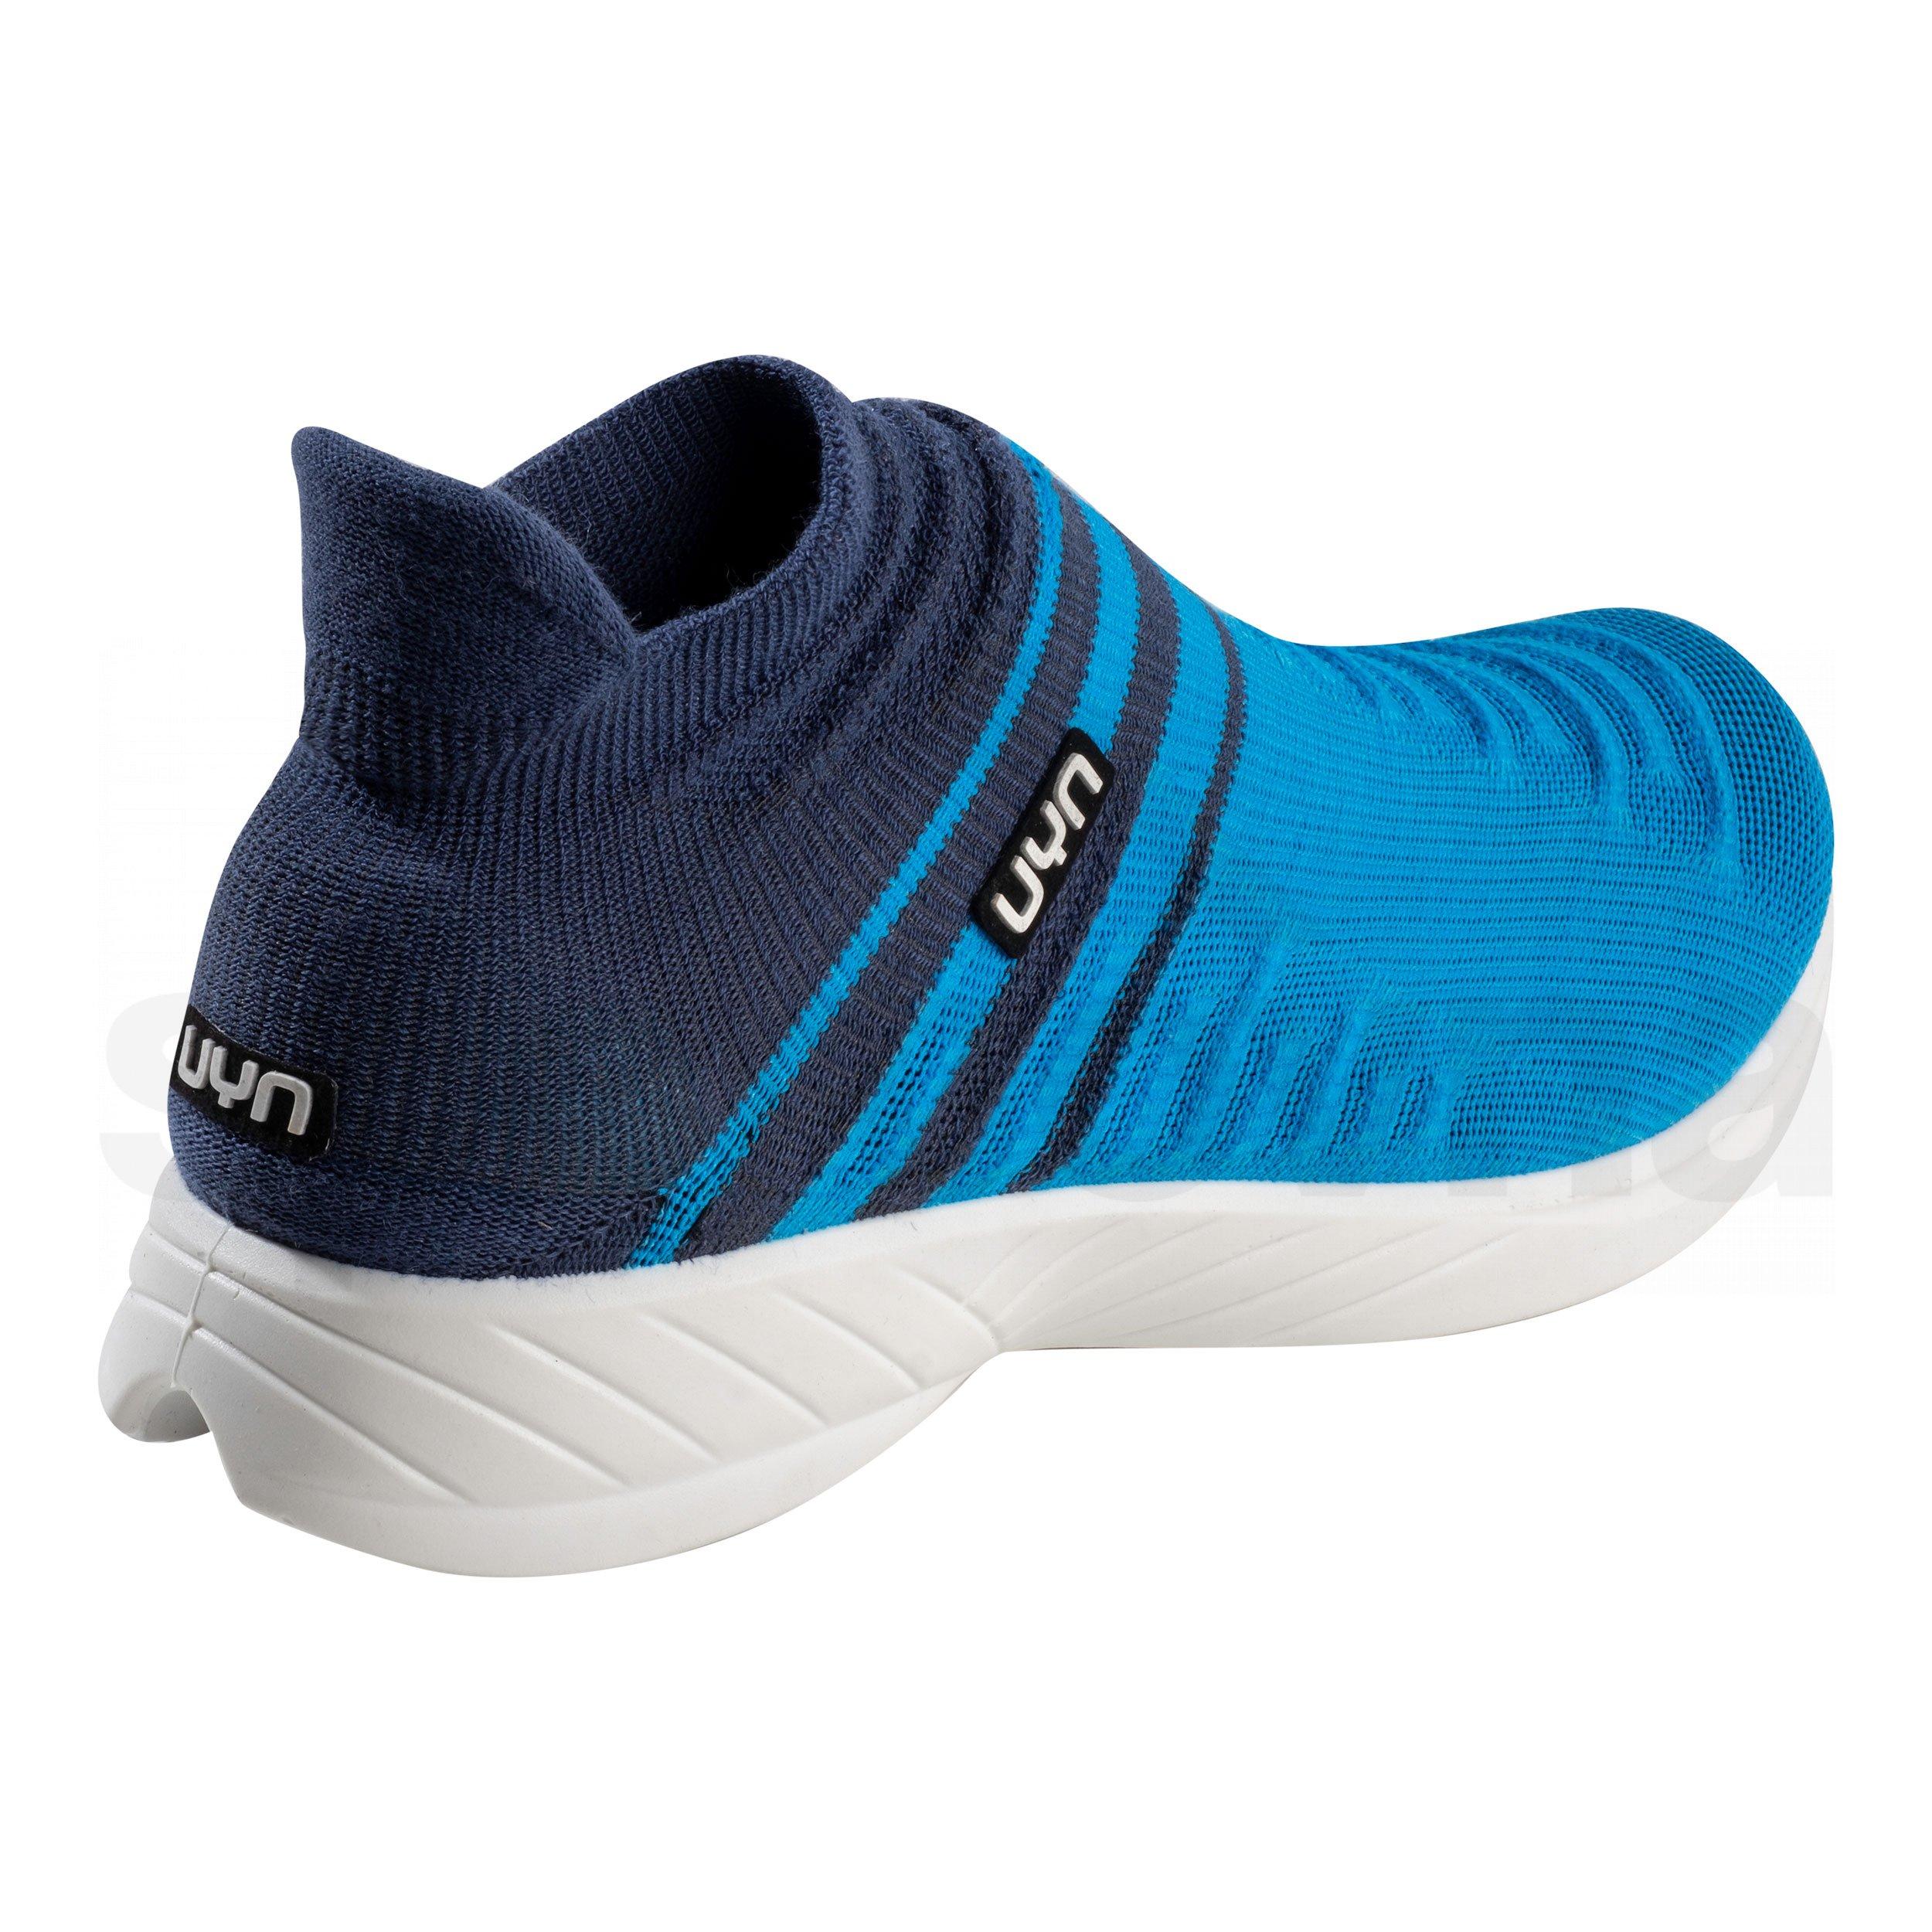 Obuv UYN X-Cross Shoes M - modrá